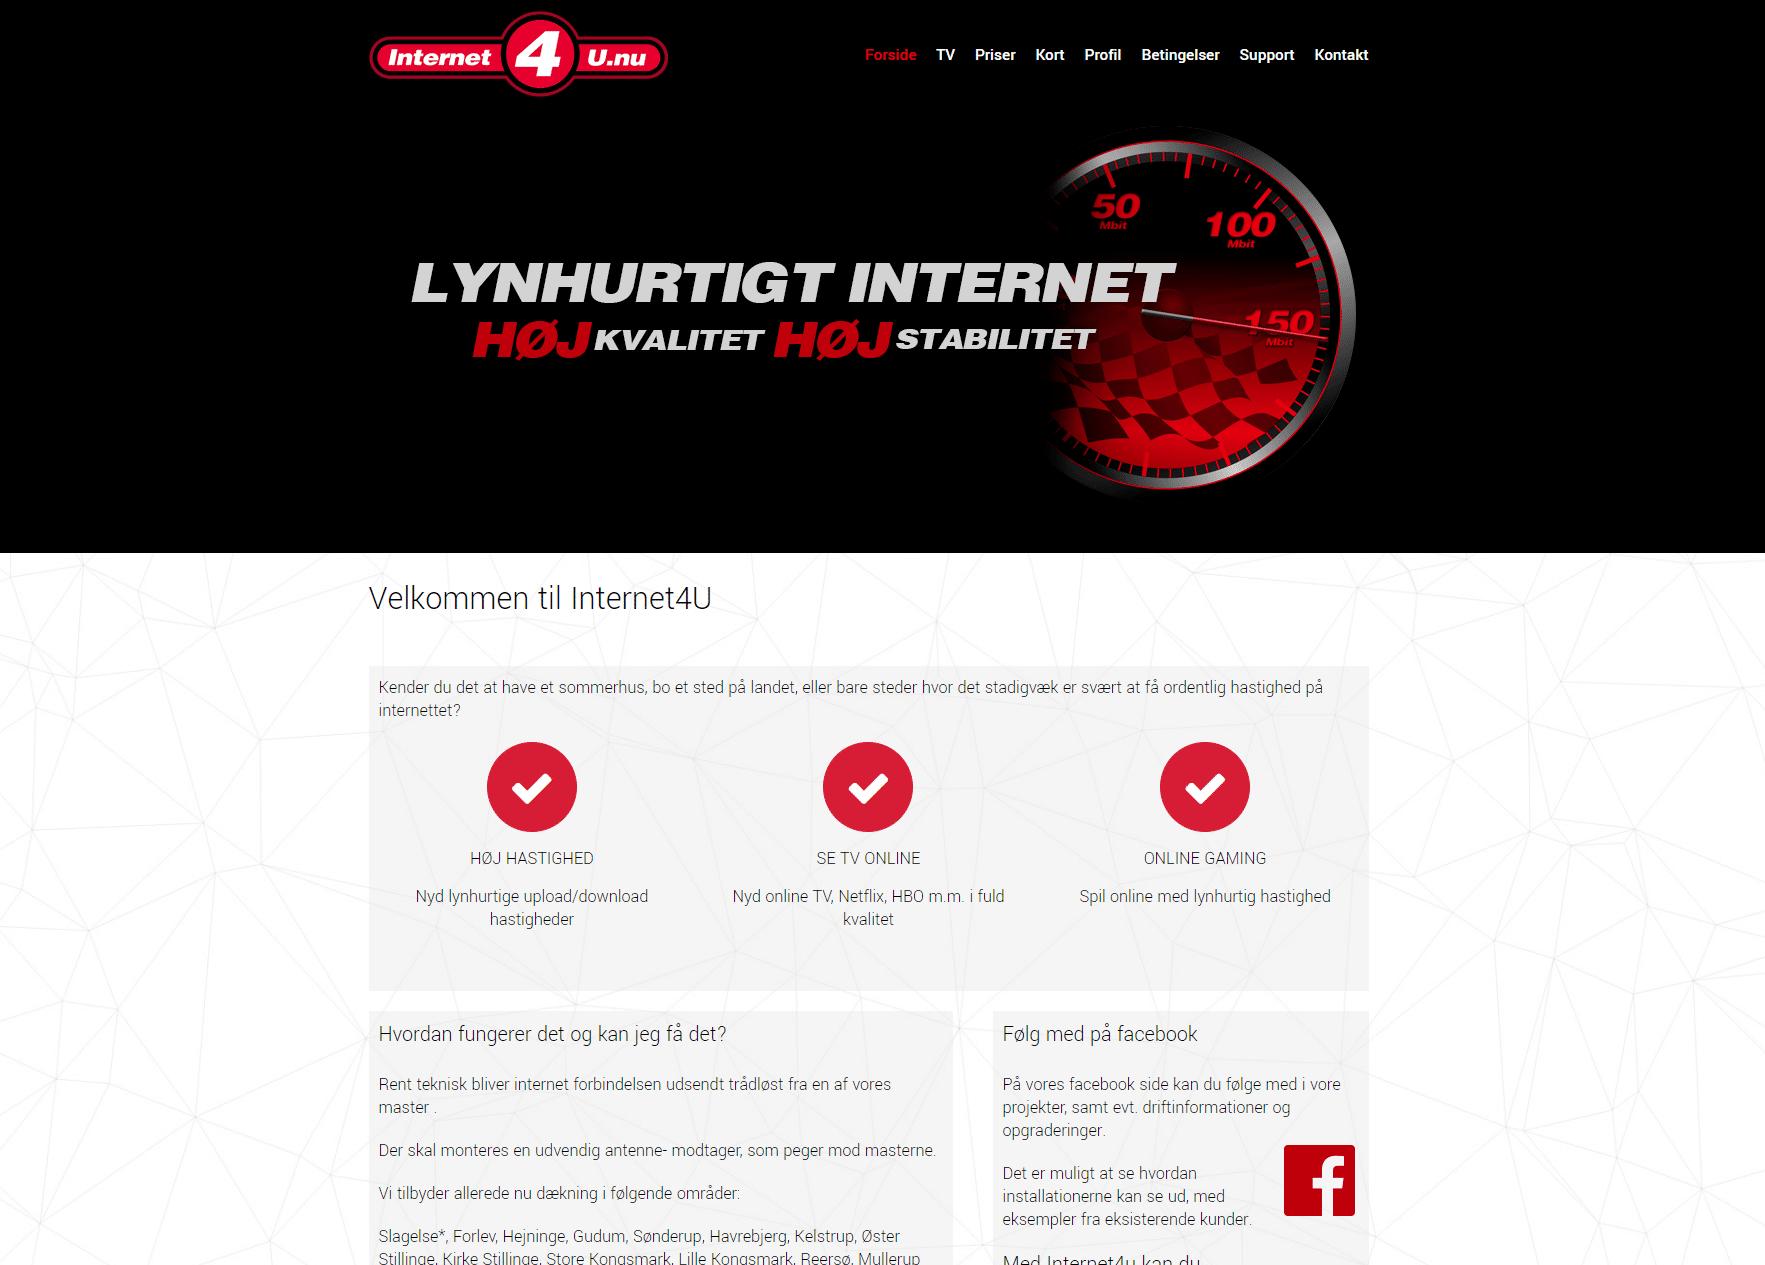 Kundeprojekt - Internet4u.nu